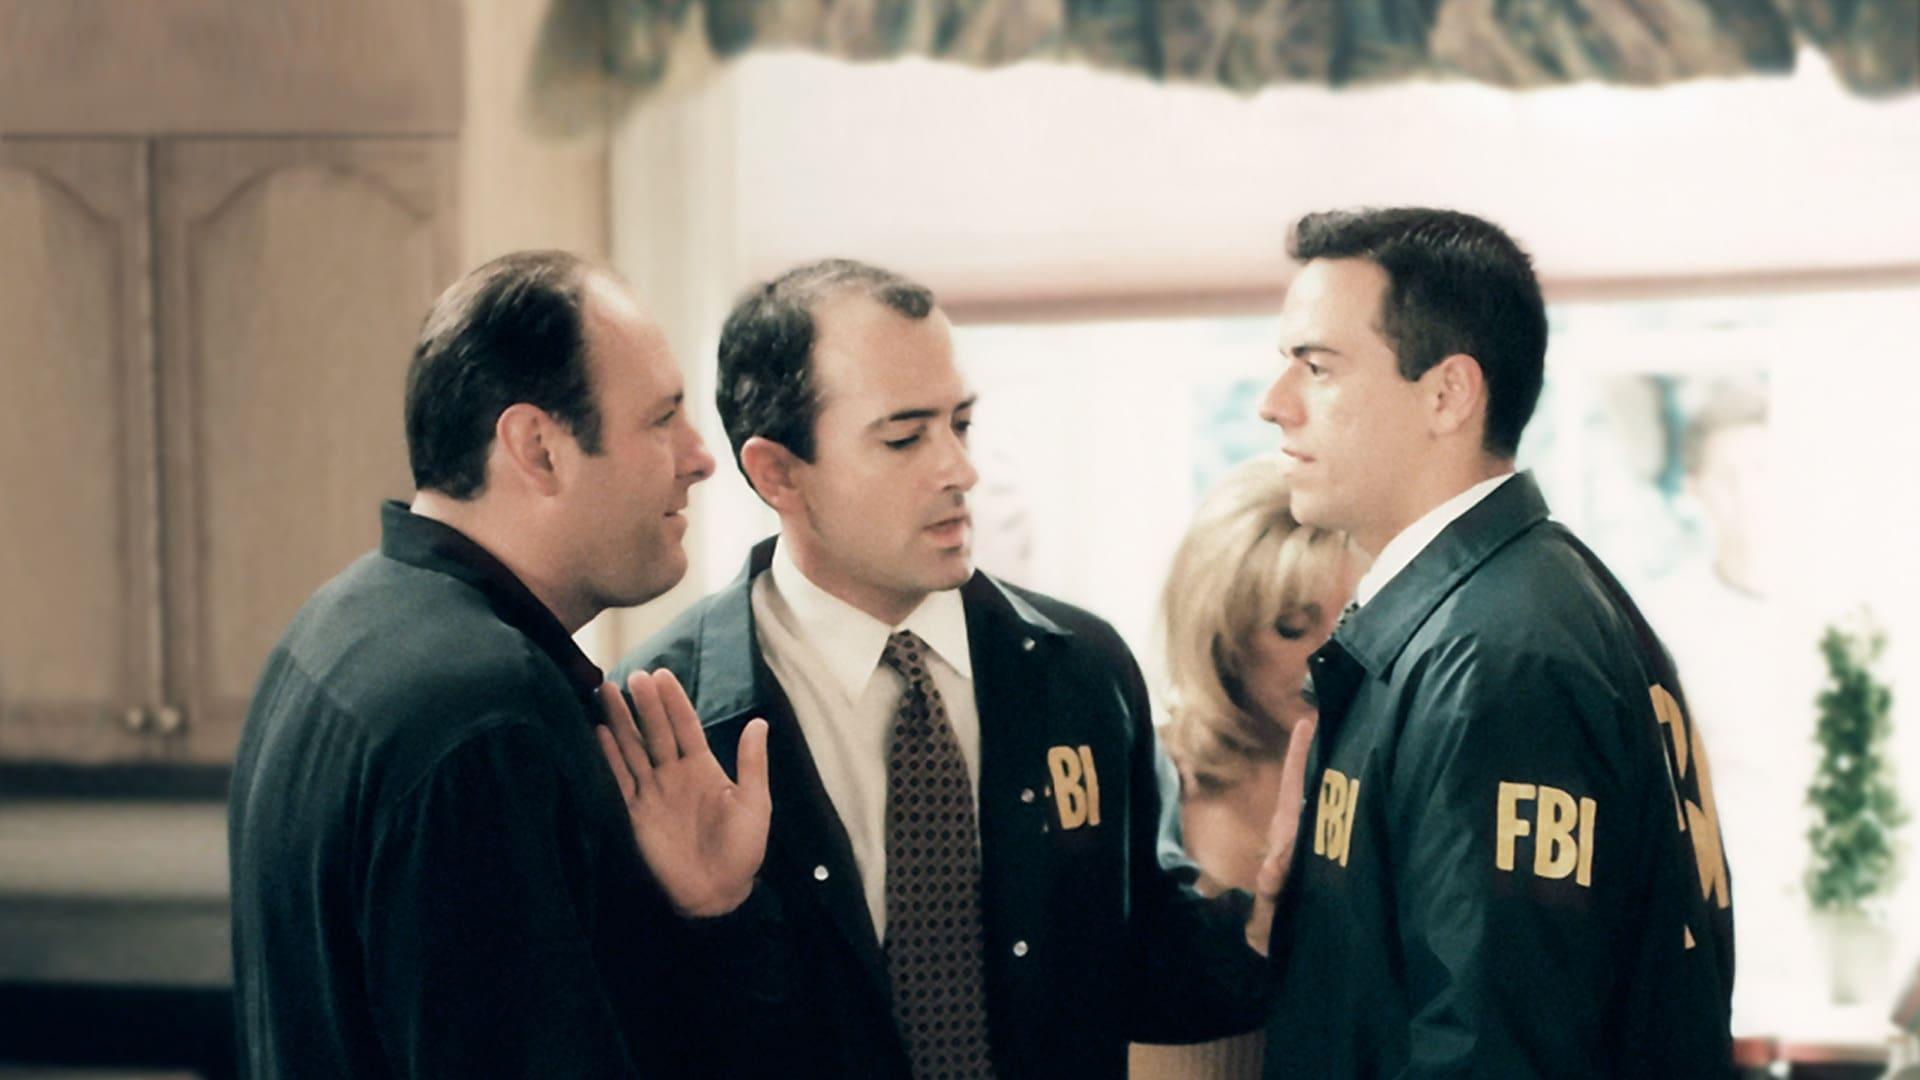 The Sopranos: Season 1 Episode 8 S01E08 | Just Watch